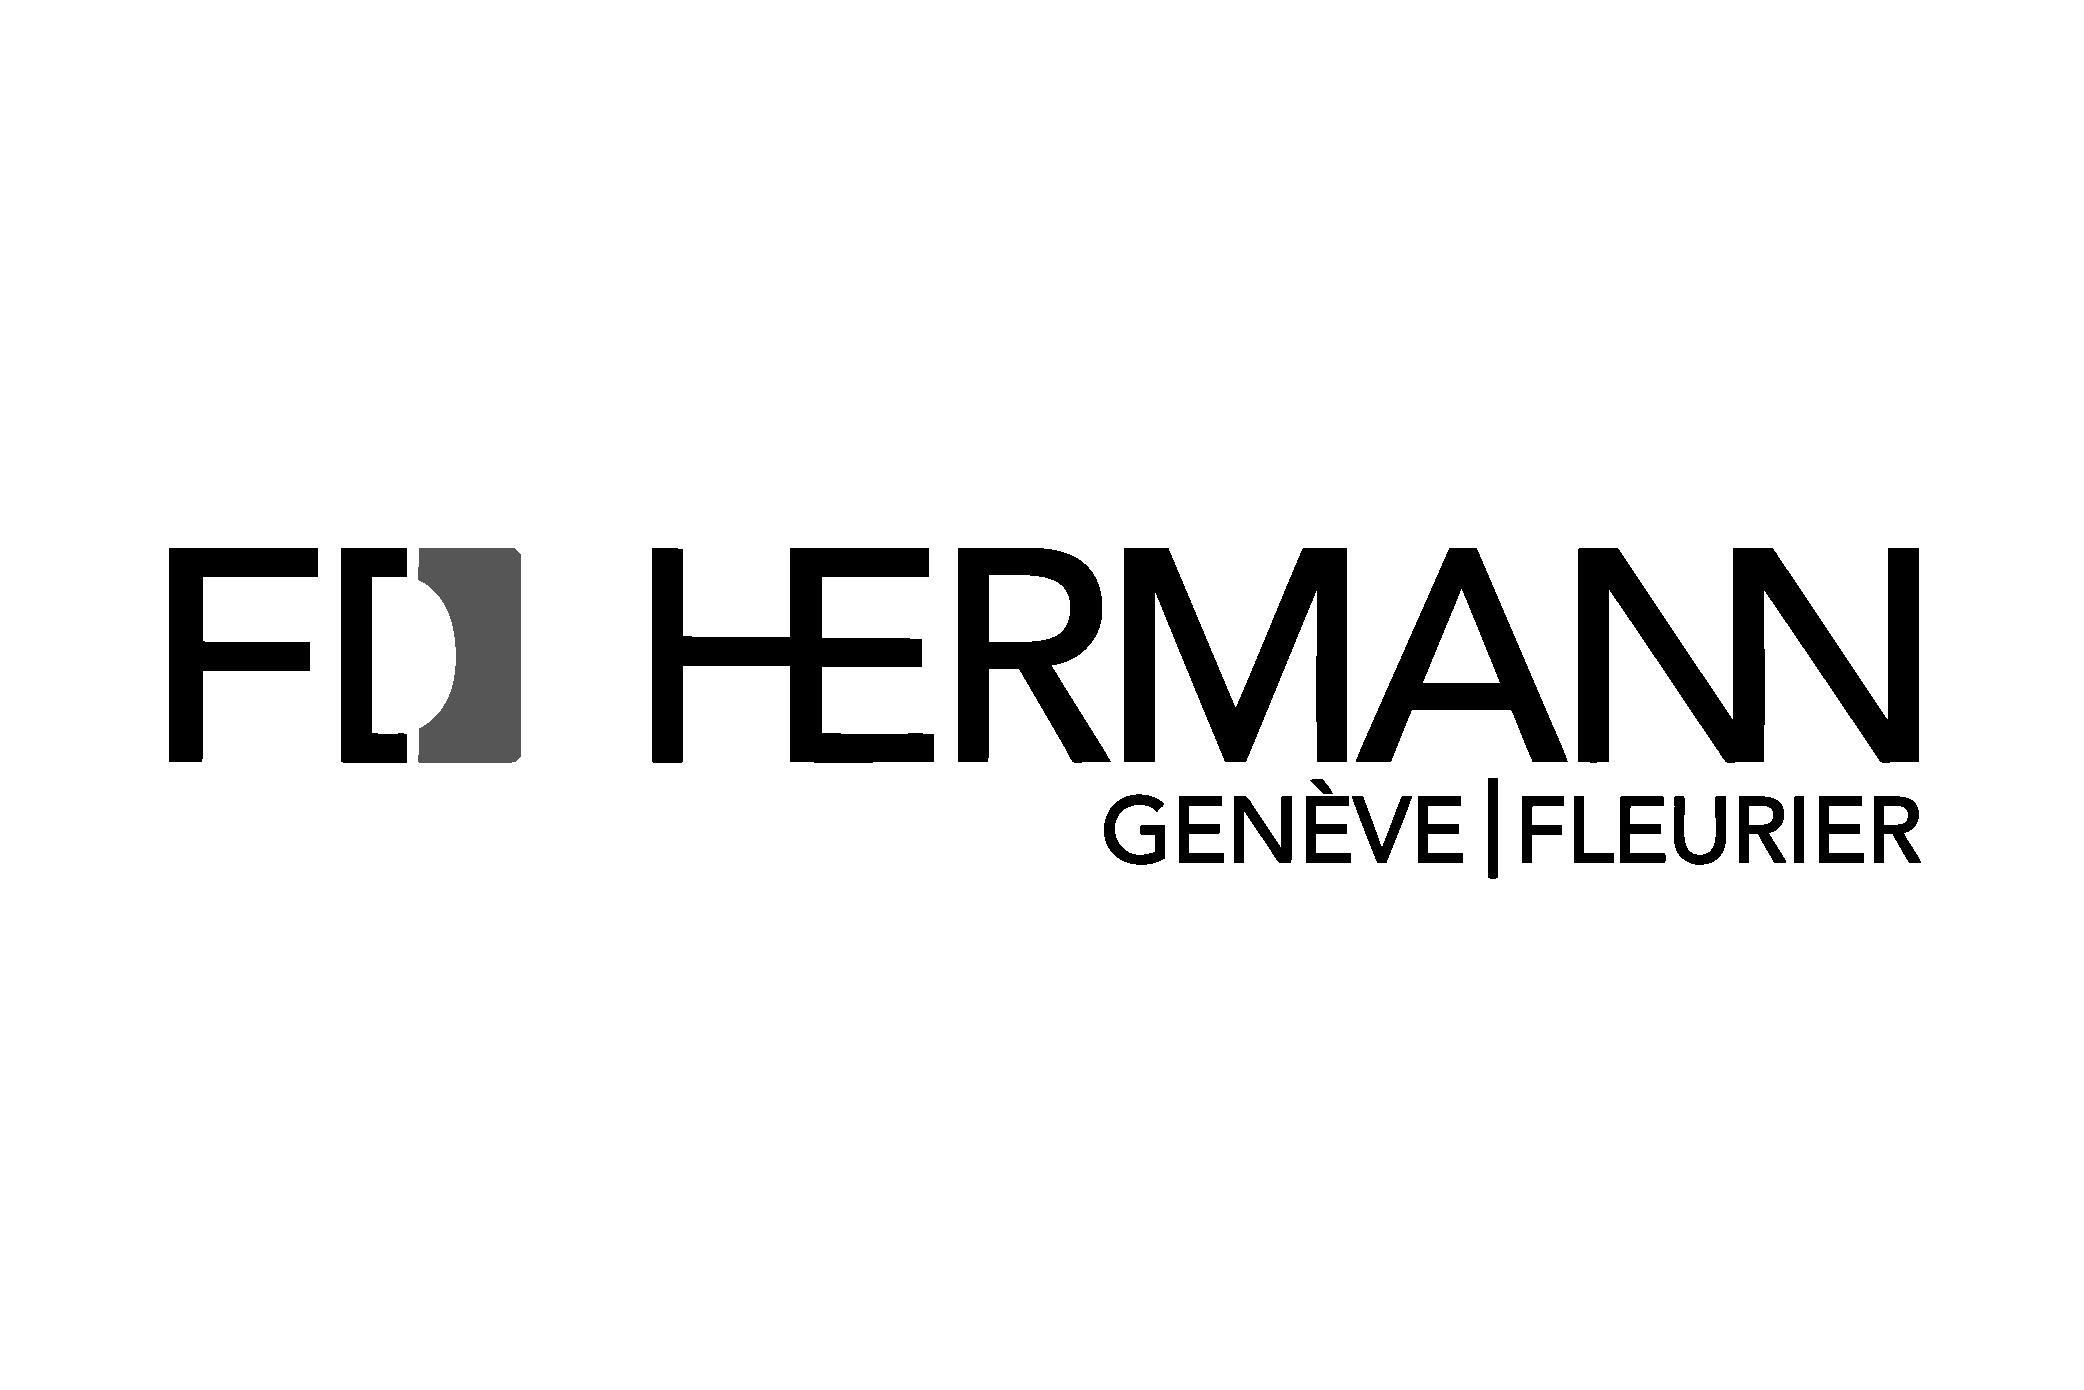 fd hermann- company logo